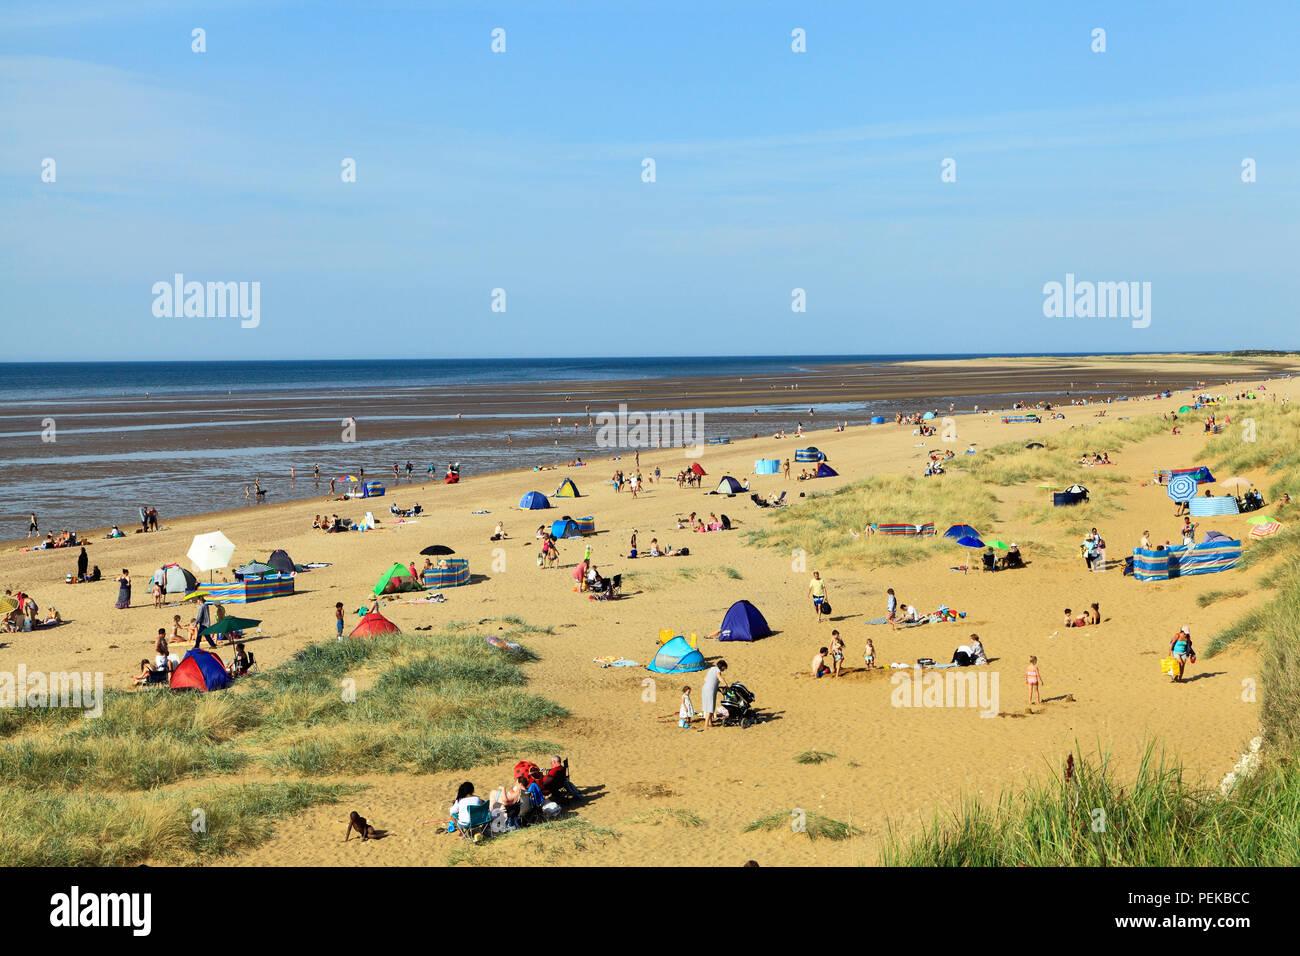 Old Hunstanton, beach, sand, bay, sunbathers, sunbeds, North Sea, coast, Norfolk, England, UK - Stock Image